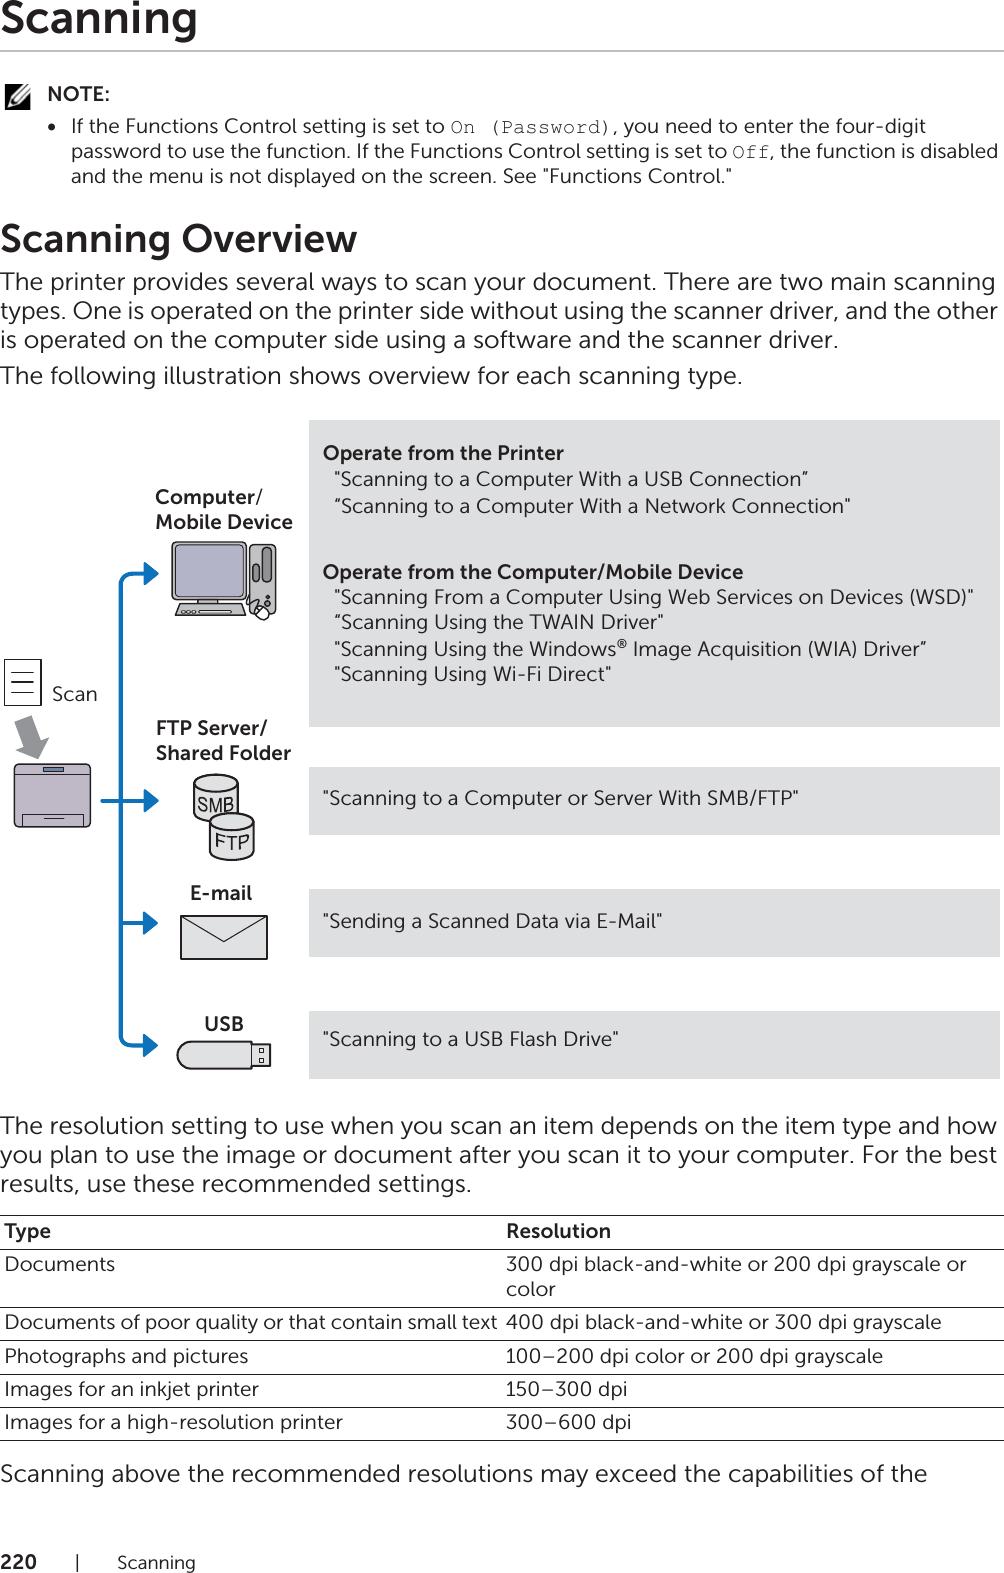 Fuji Xerox H825CDW Color Multifunction Printer User Manual